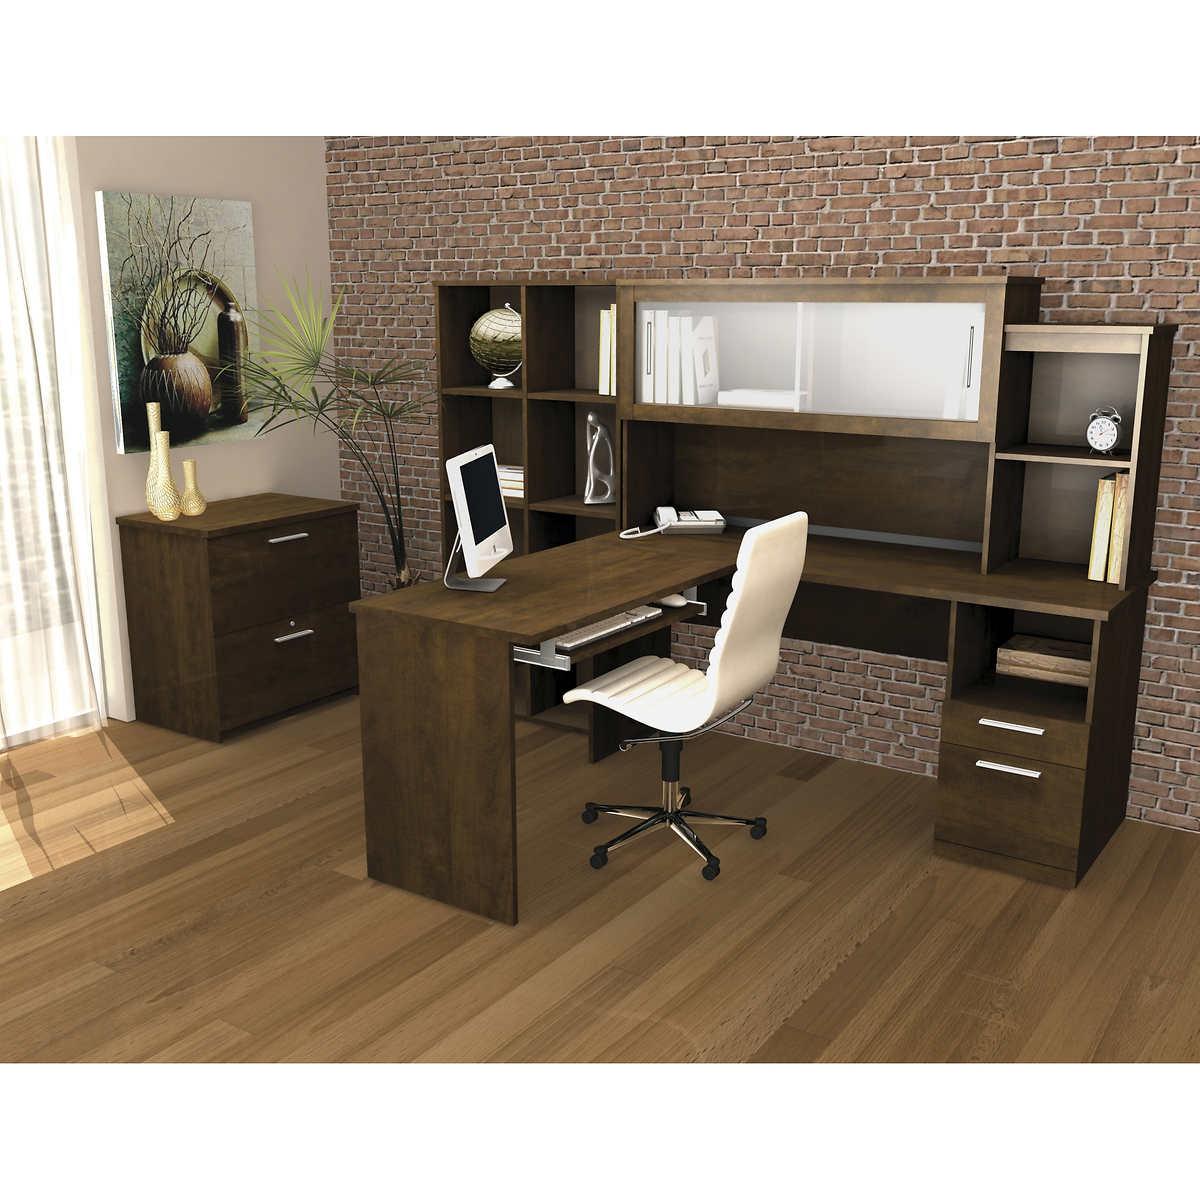 71 Austin Worklife Office Furniture